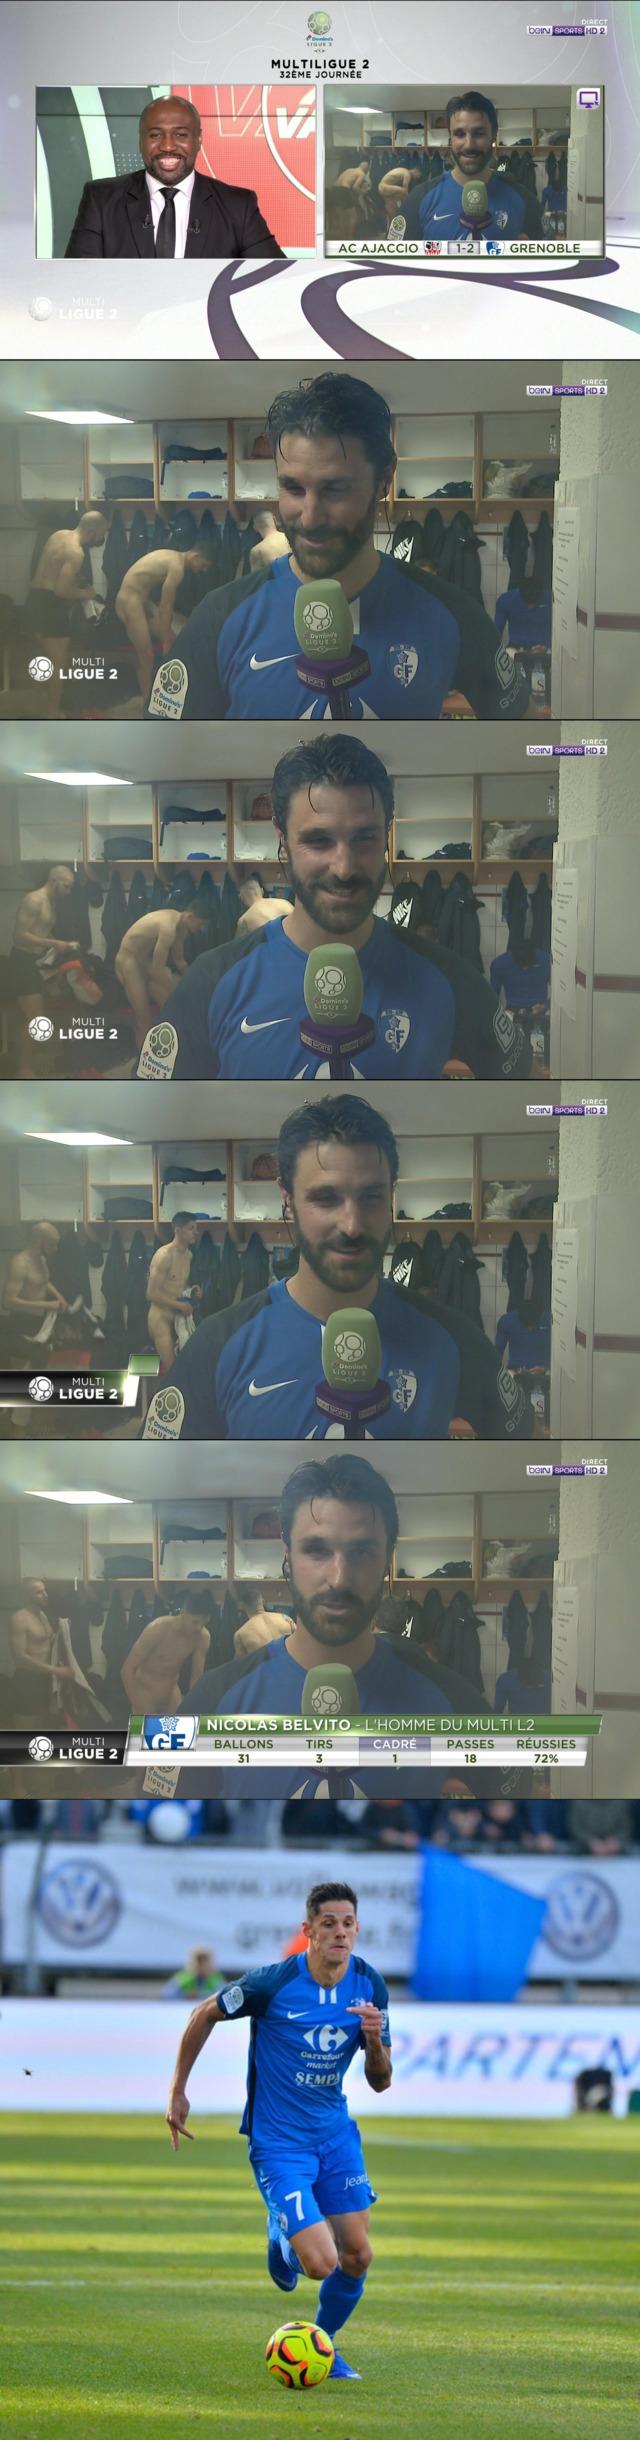 footballer florian sotoca caught naked locker room during interview